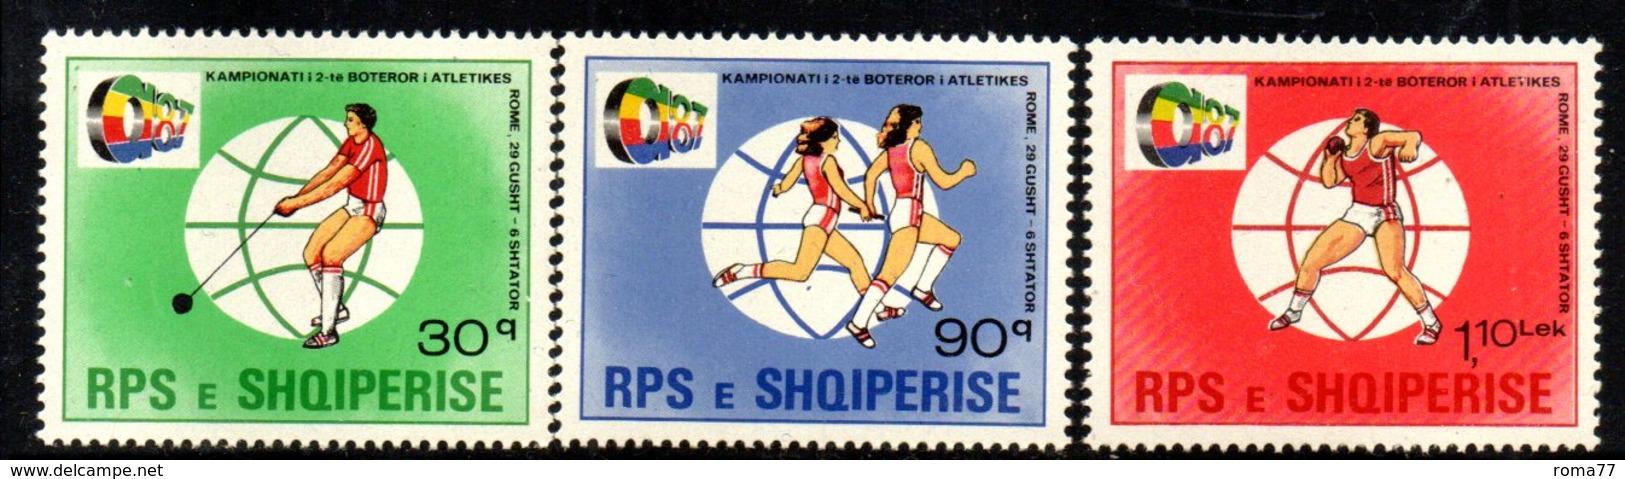 XP4019 - ALBANIA 1987 , Yvert Serie N. 2148/2150  ***  Atletica - Albania